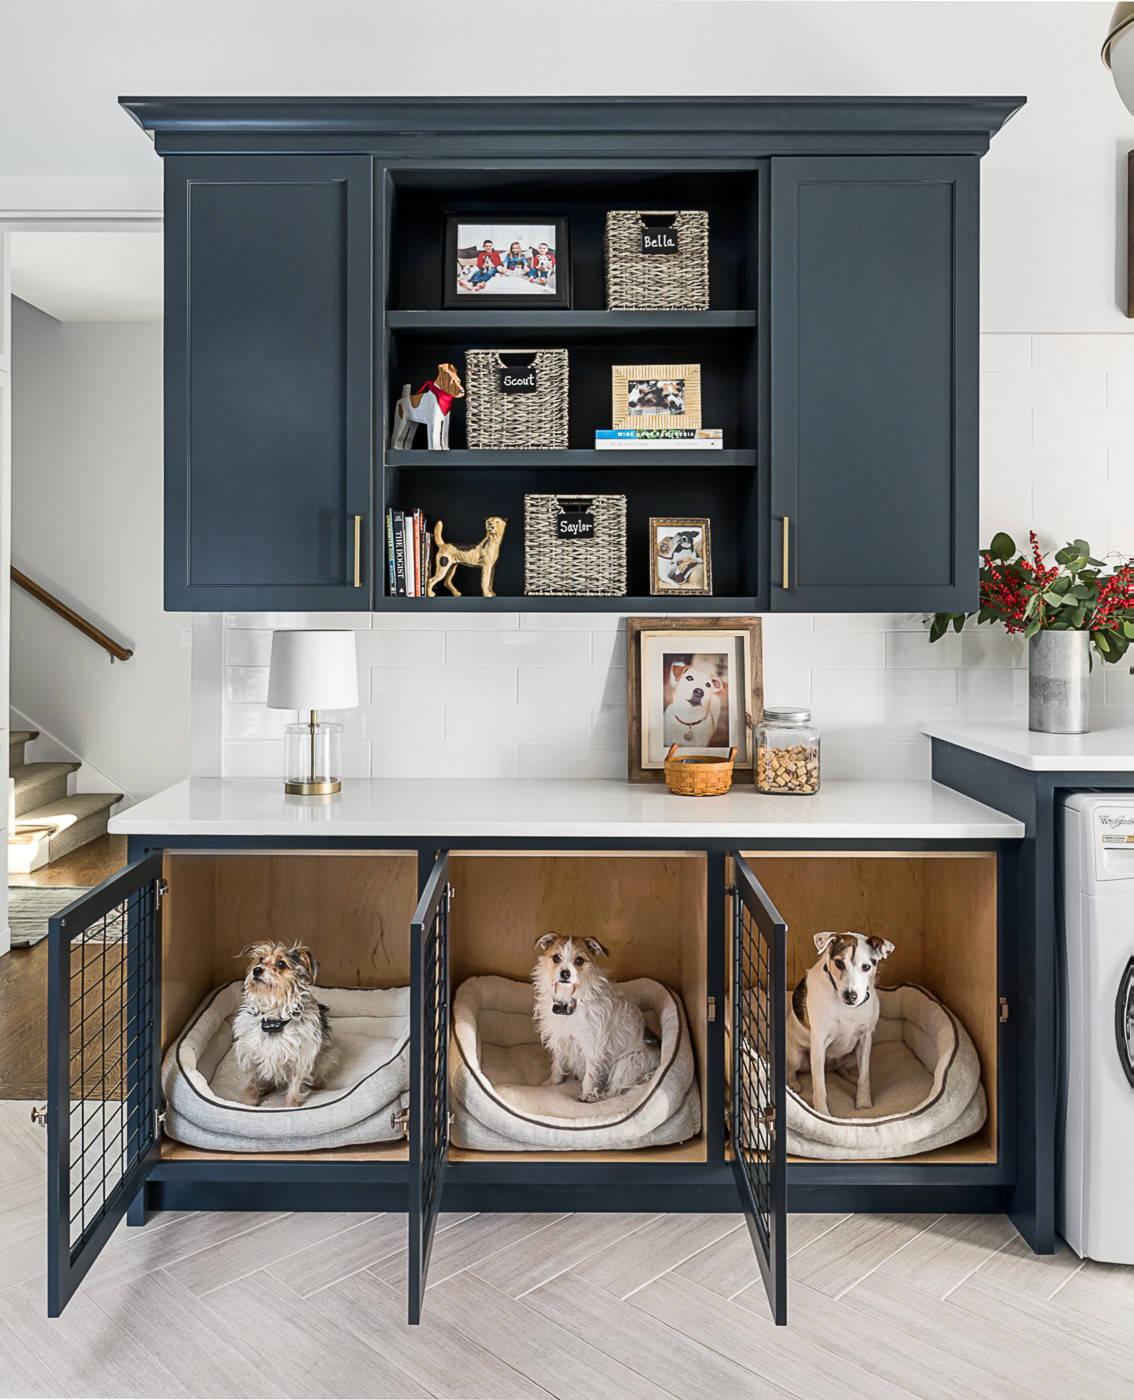 75 Beautiful Farmhouse Laundry Room Pictures Ideas January 2021 Houzz